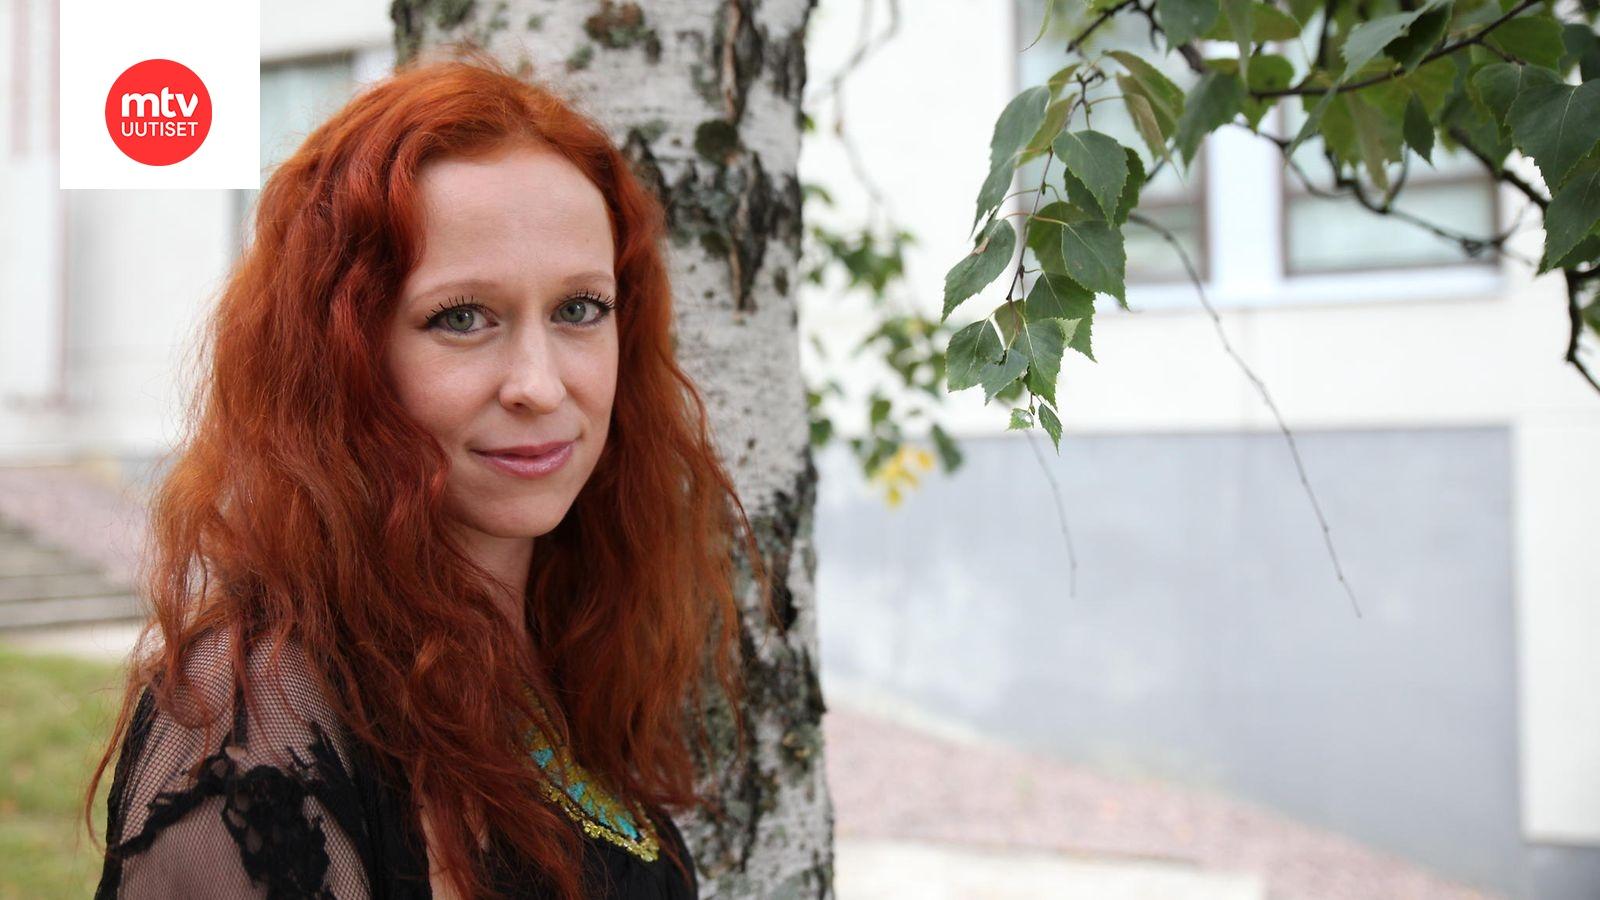 Leena Johanna Salomaa